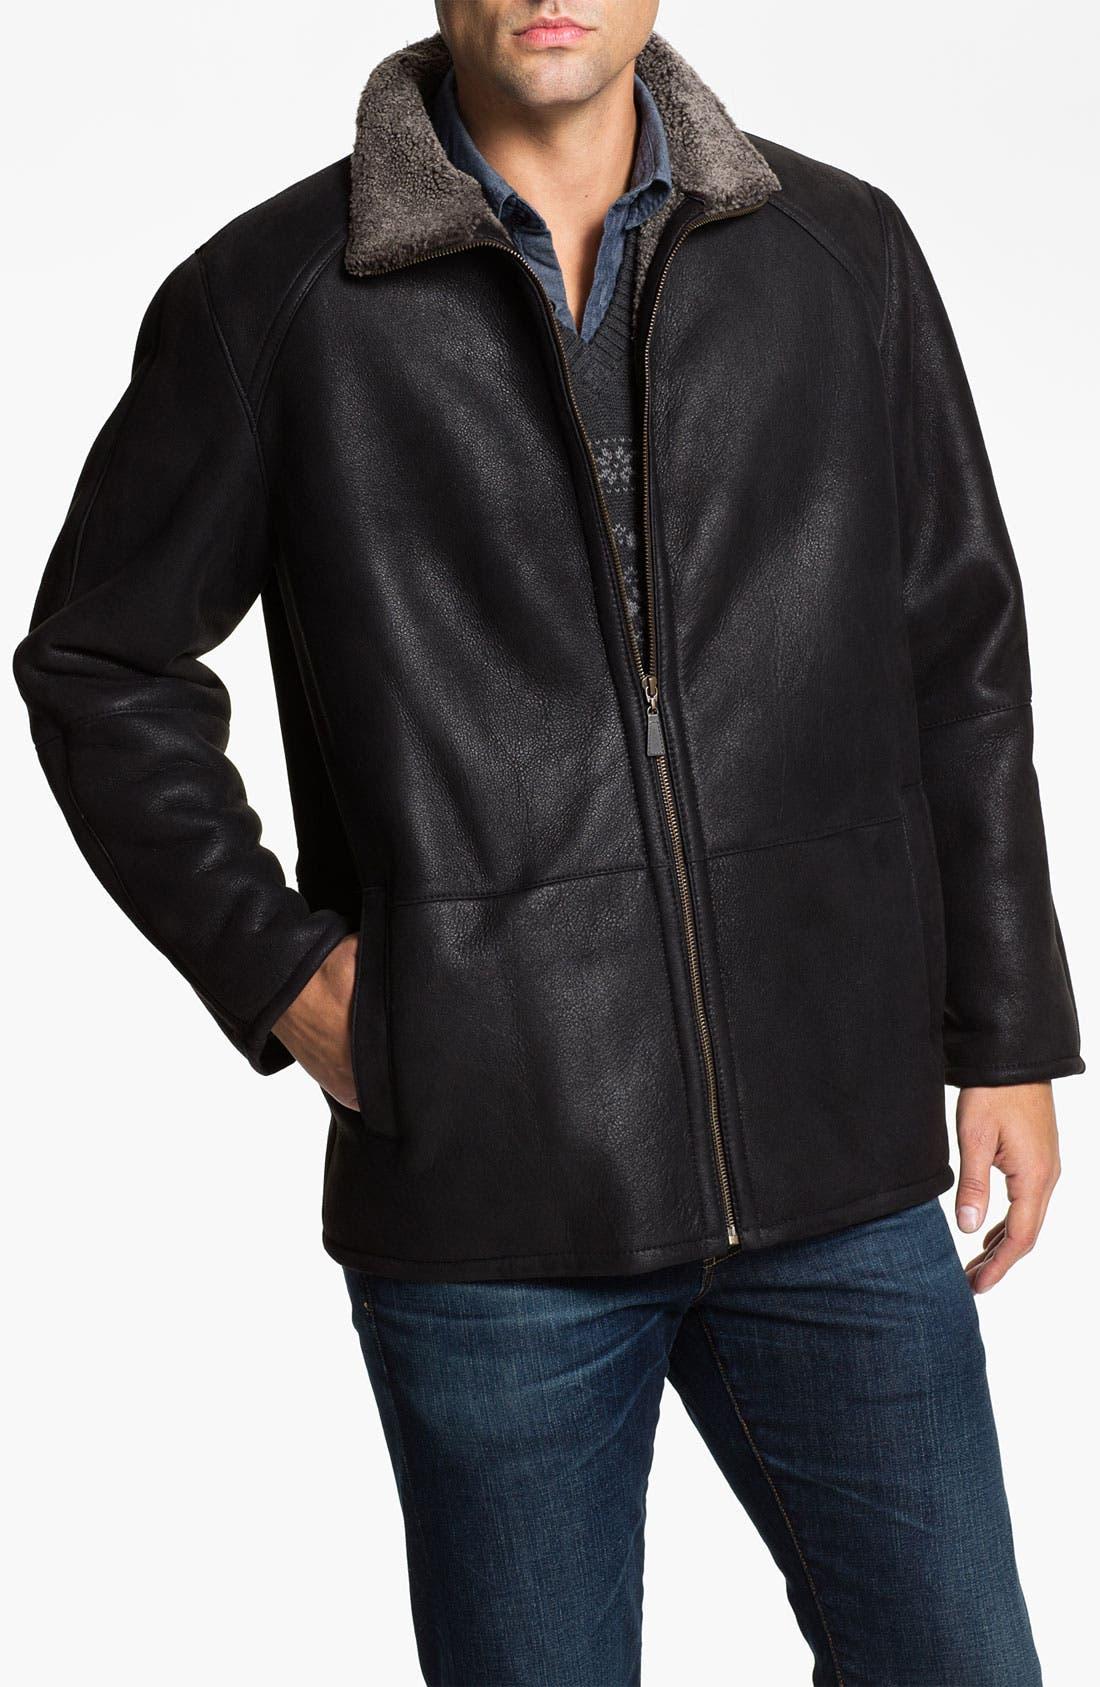 Alternate Image 1 Selected - Blue Duck Leather Jacket